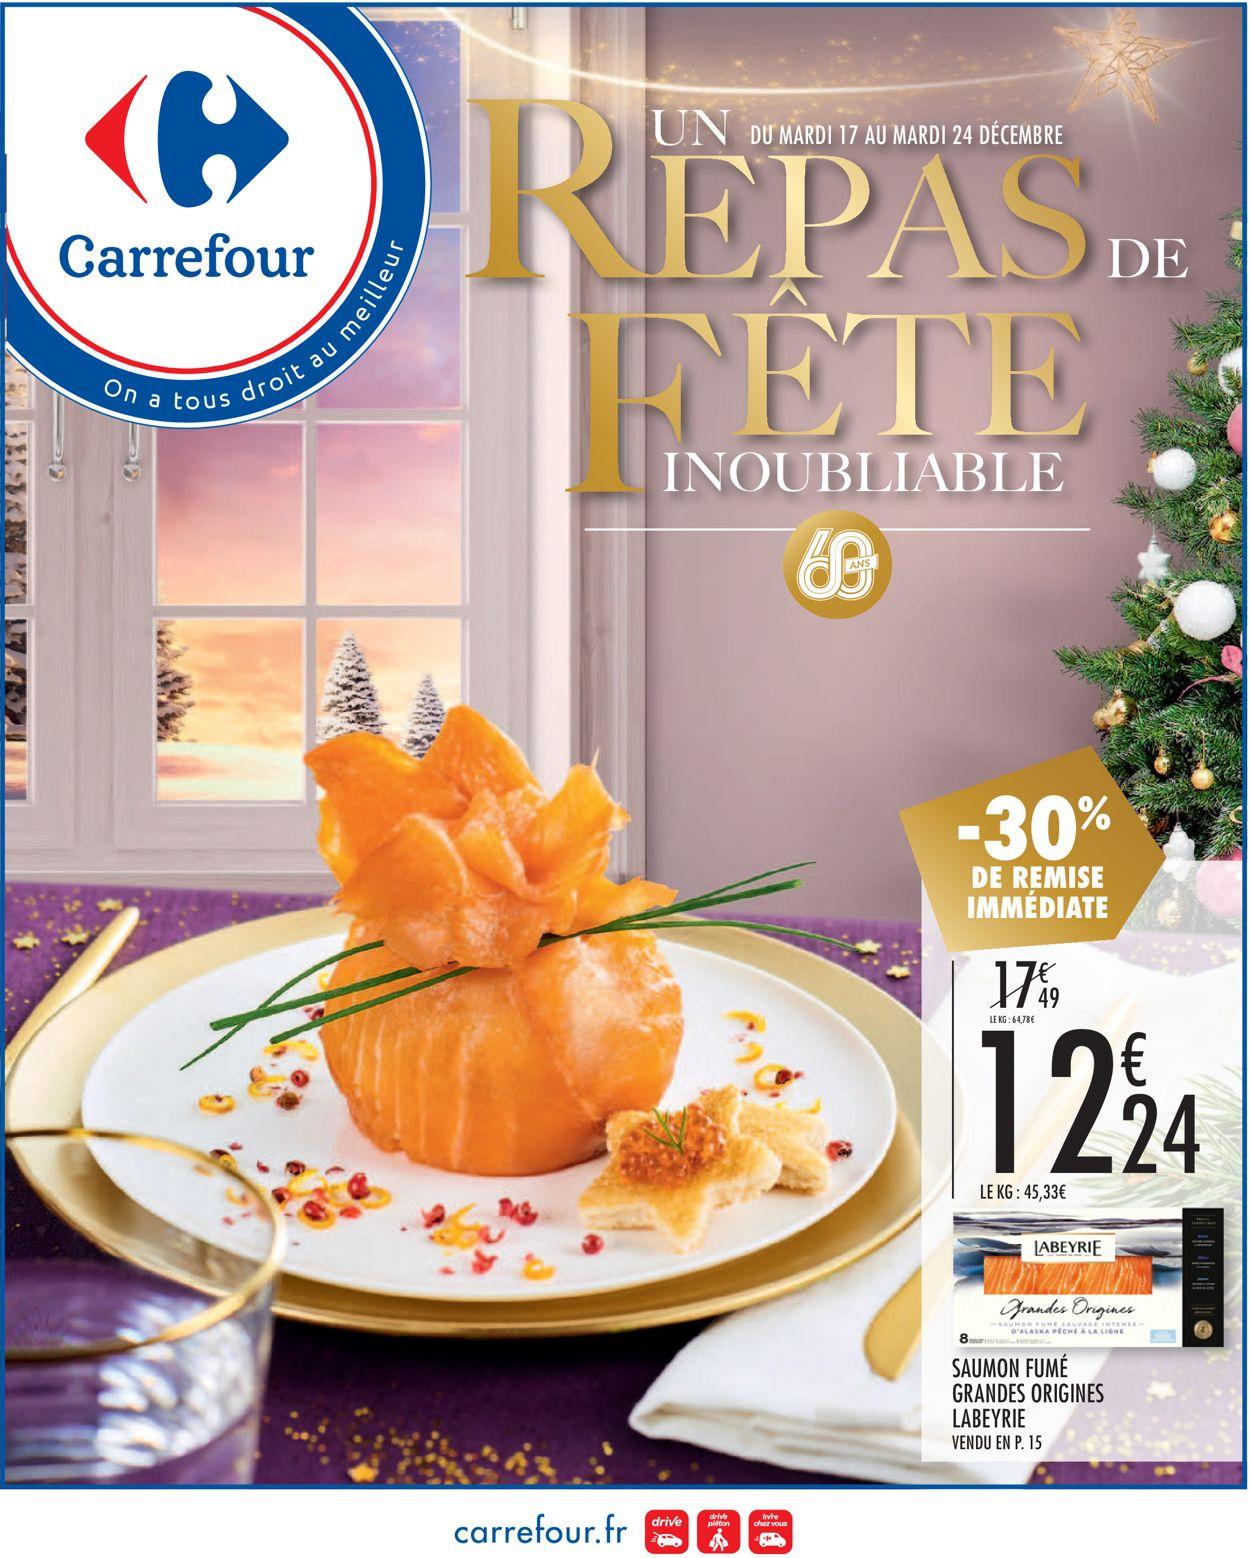 Carrefour - catalogue de Noël 2019 Catalogue - 17.12-24.12.2019